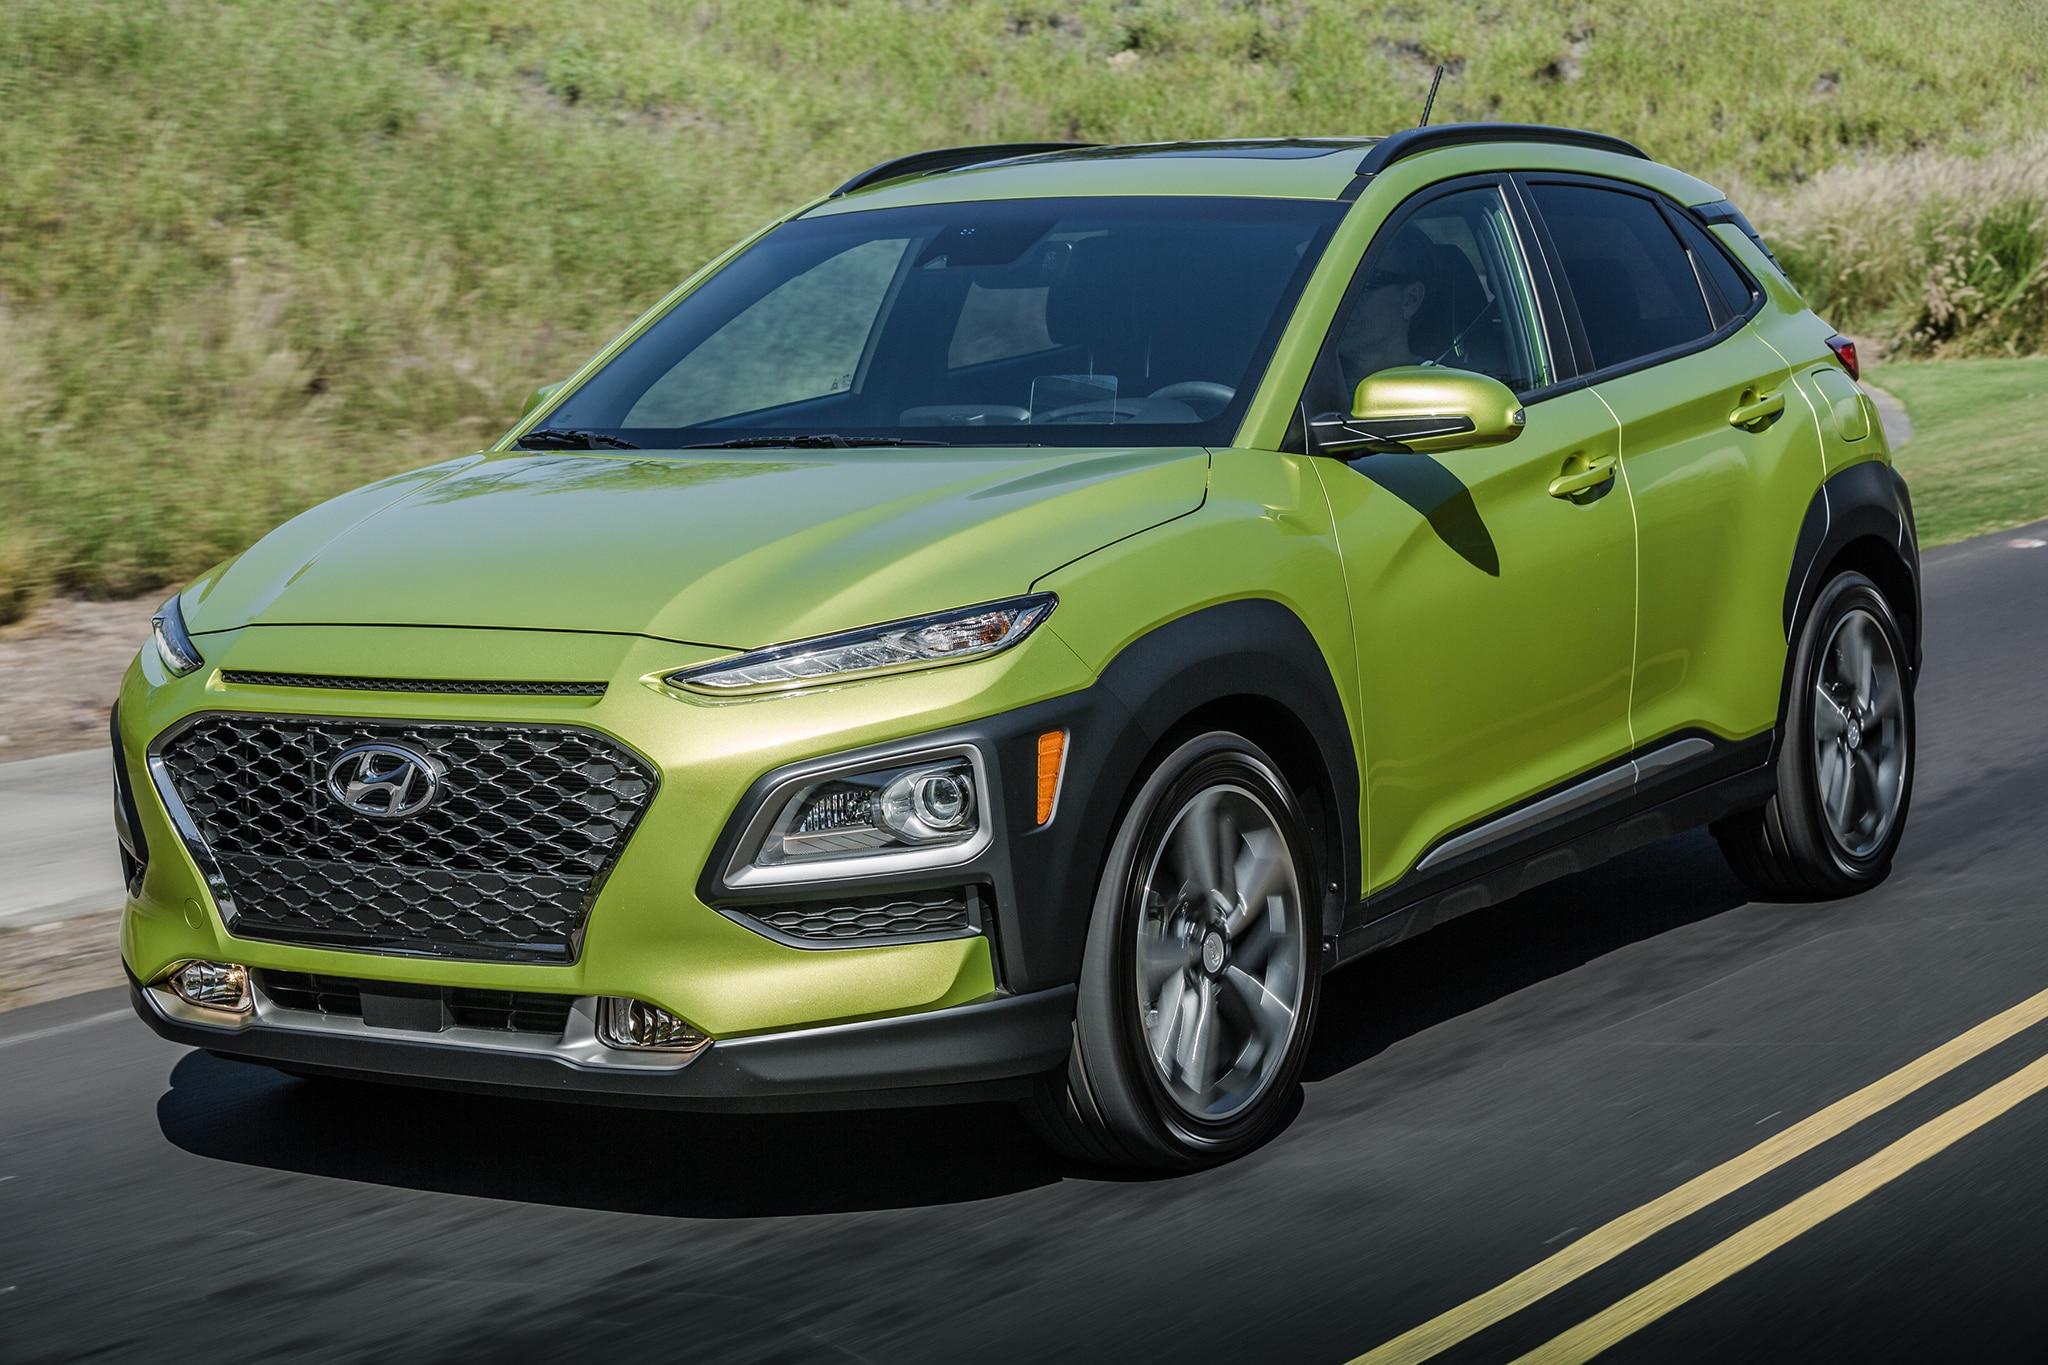 2018 Hyundai Kona Front Three Quarter In Motion 03